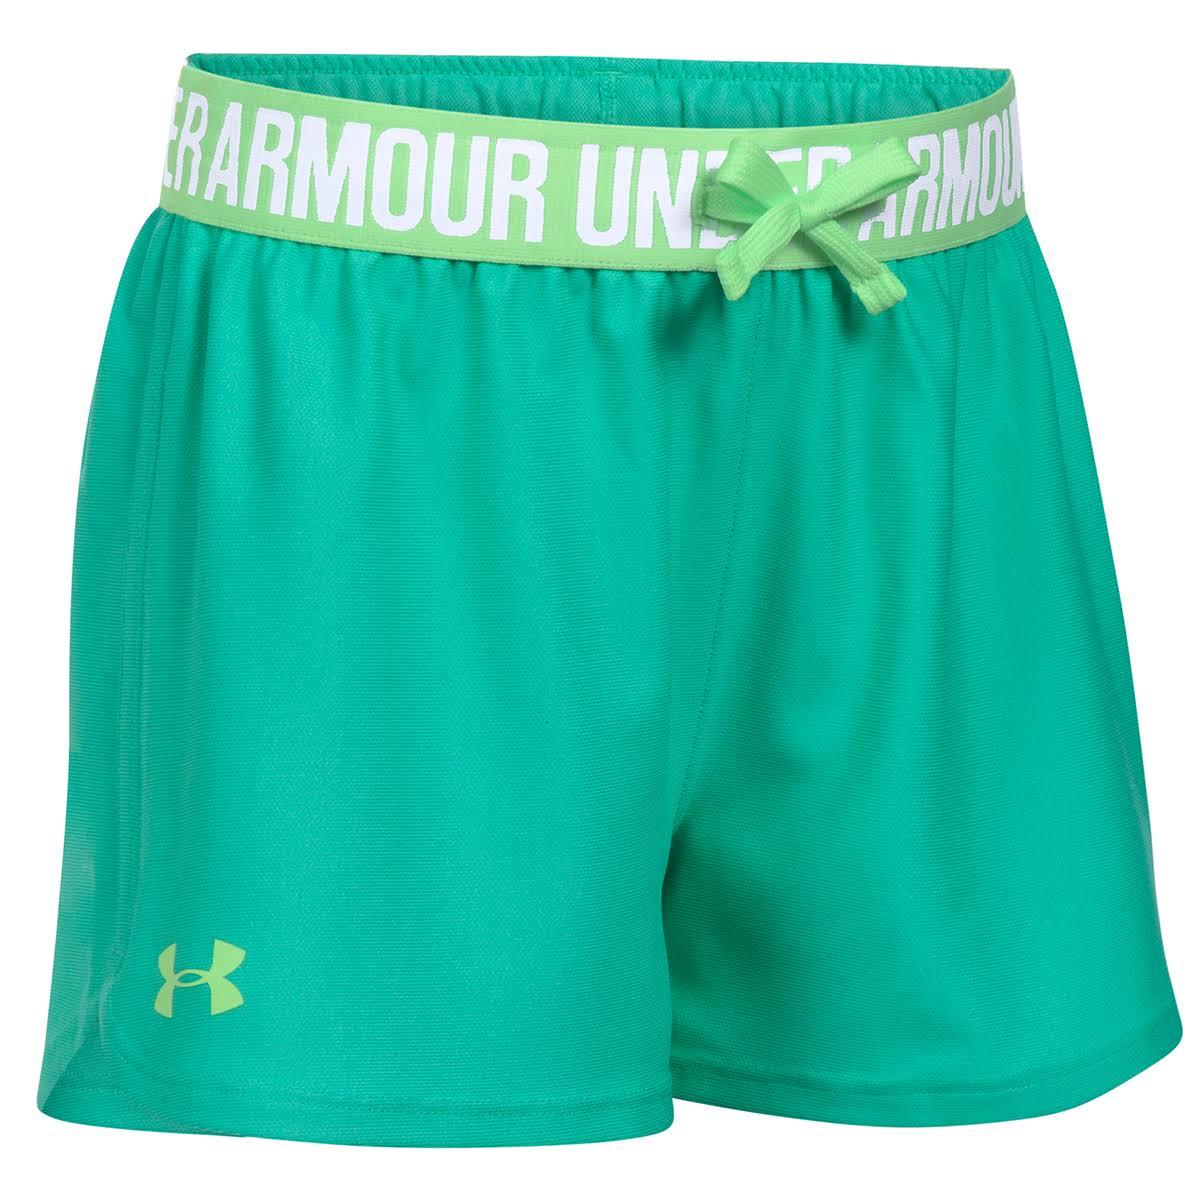 De Play Absinthe Ua Pantalón Up Niñas Para Corto Armour Green Ysm Under 1xIE6B